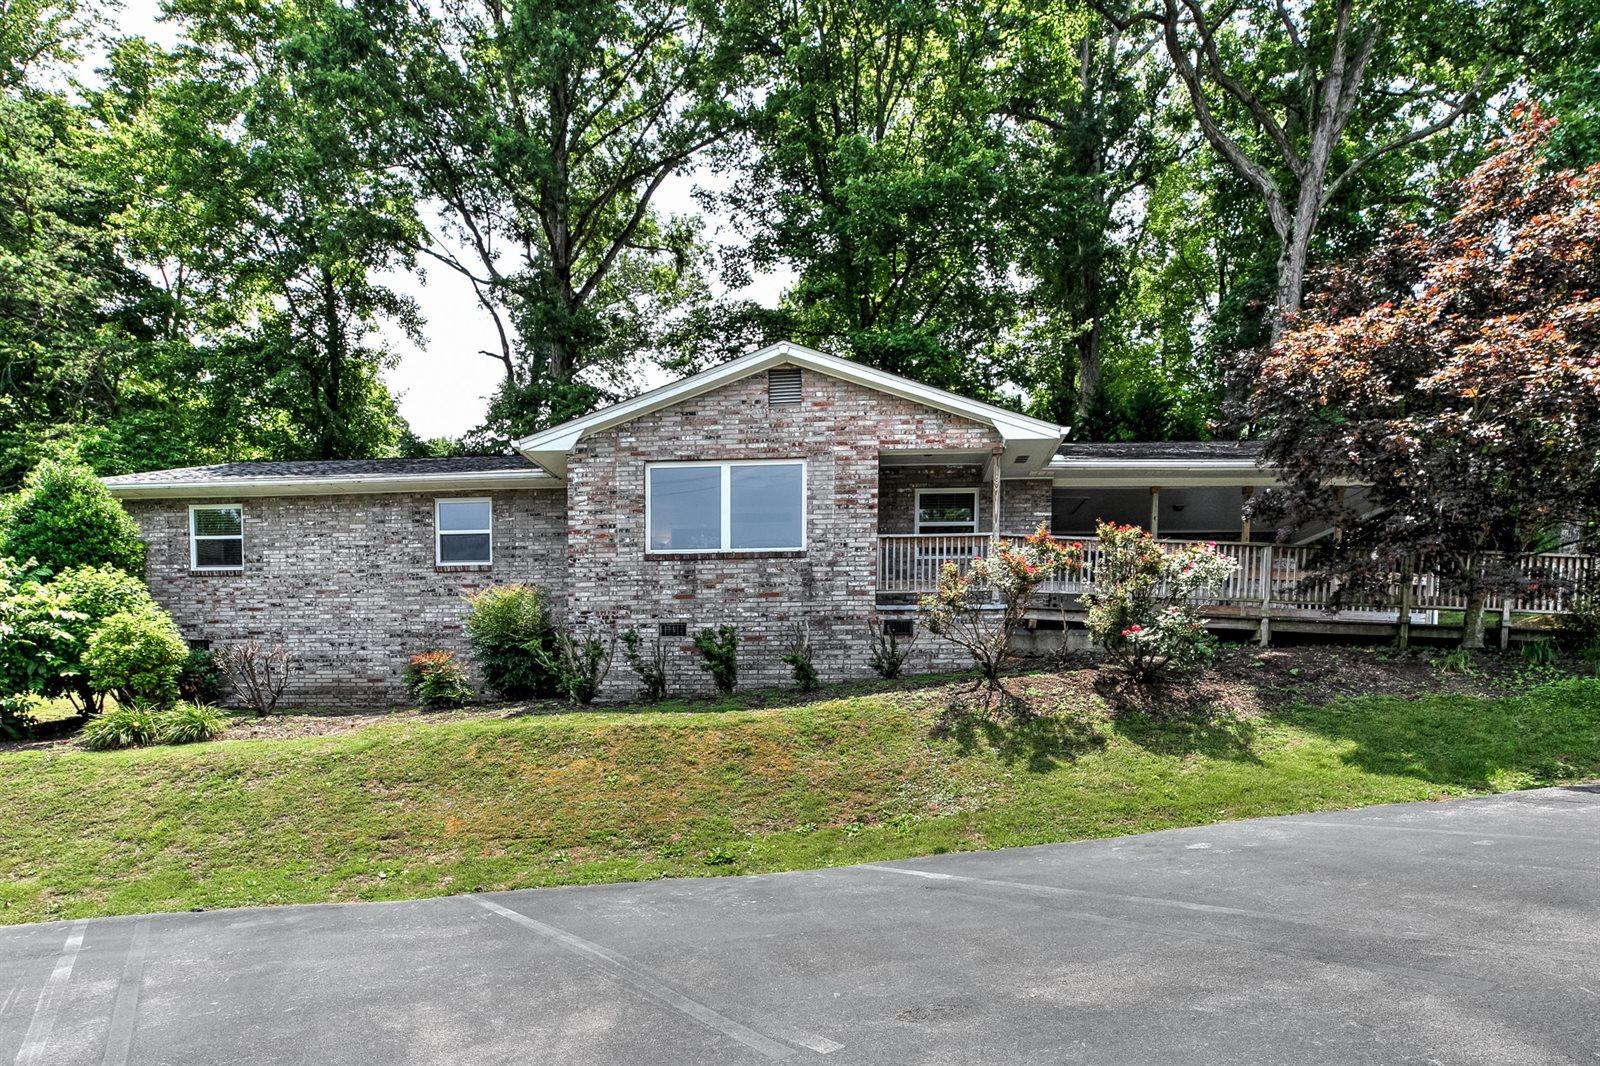 109 Stekoia Lane, Knoxville, TN 37912